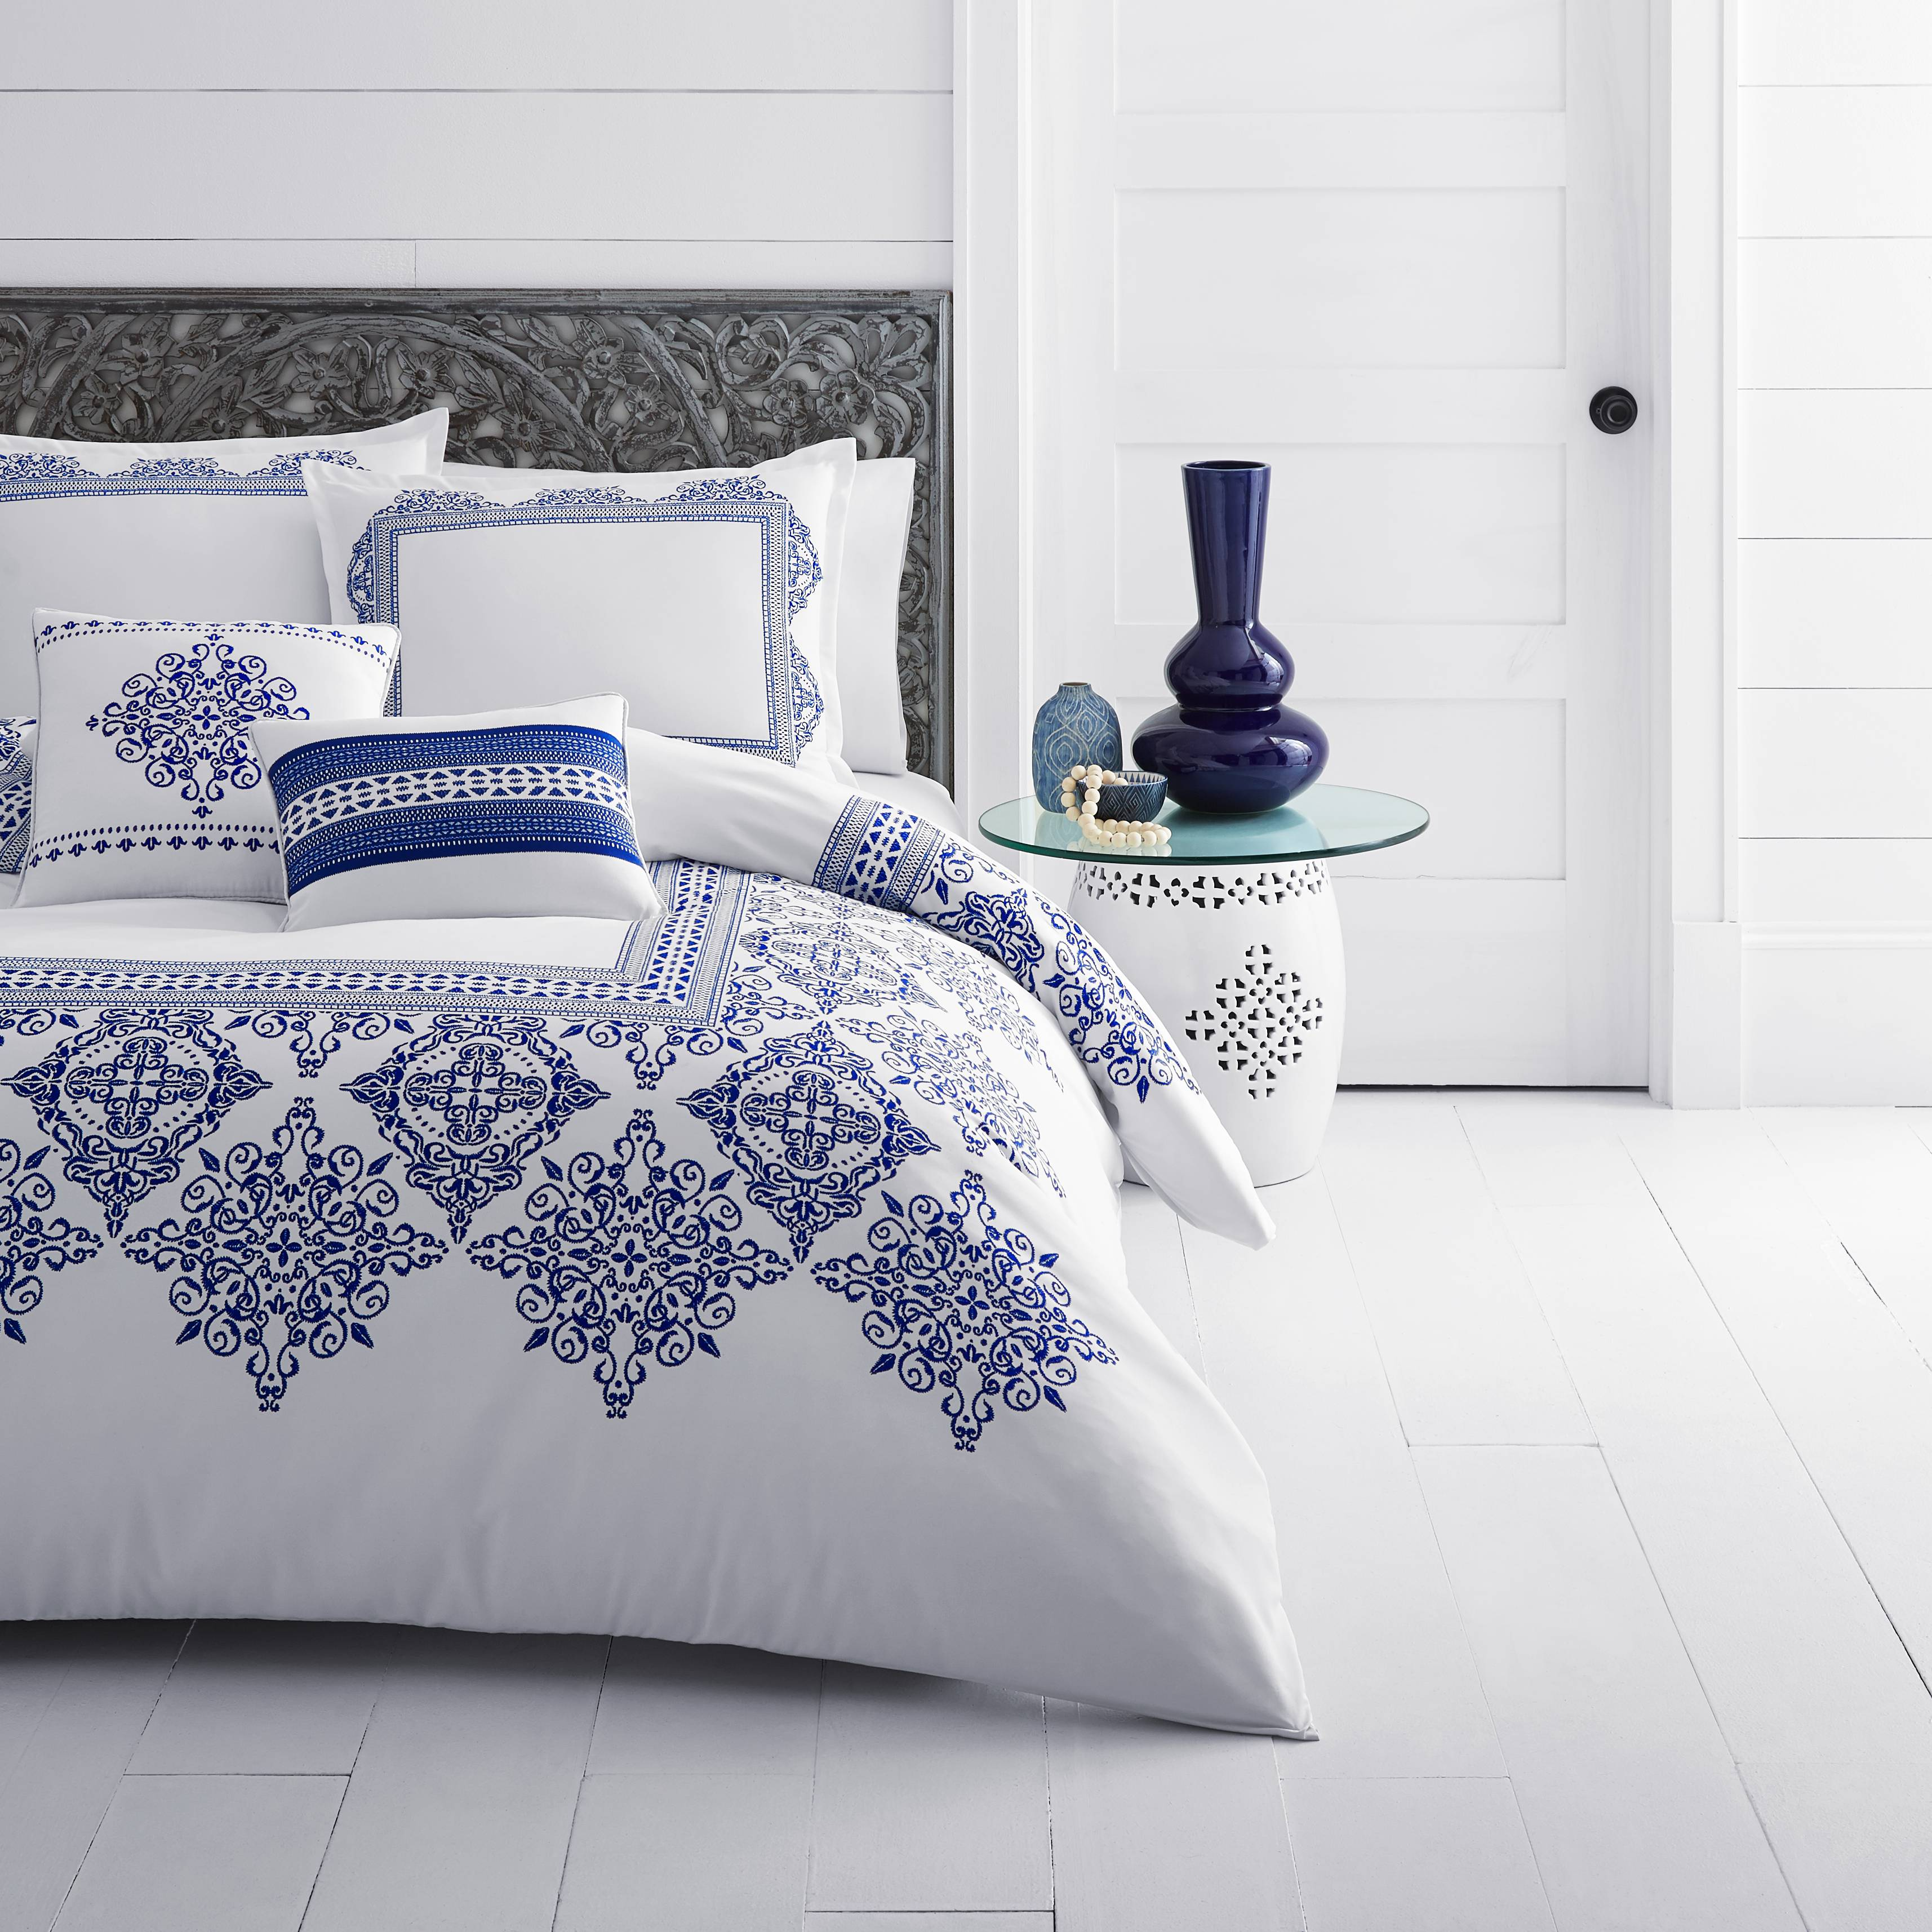 Azalea Skye Cora White Comforter Set, Full/Queen